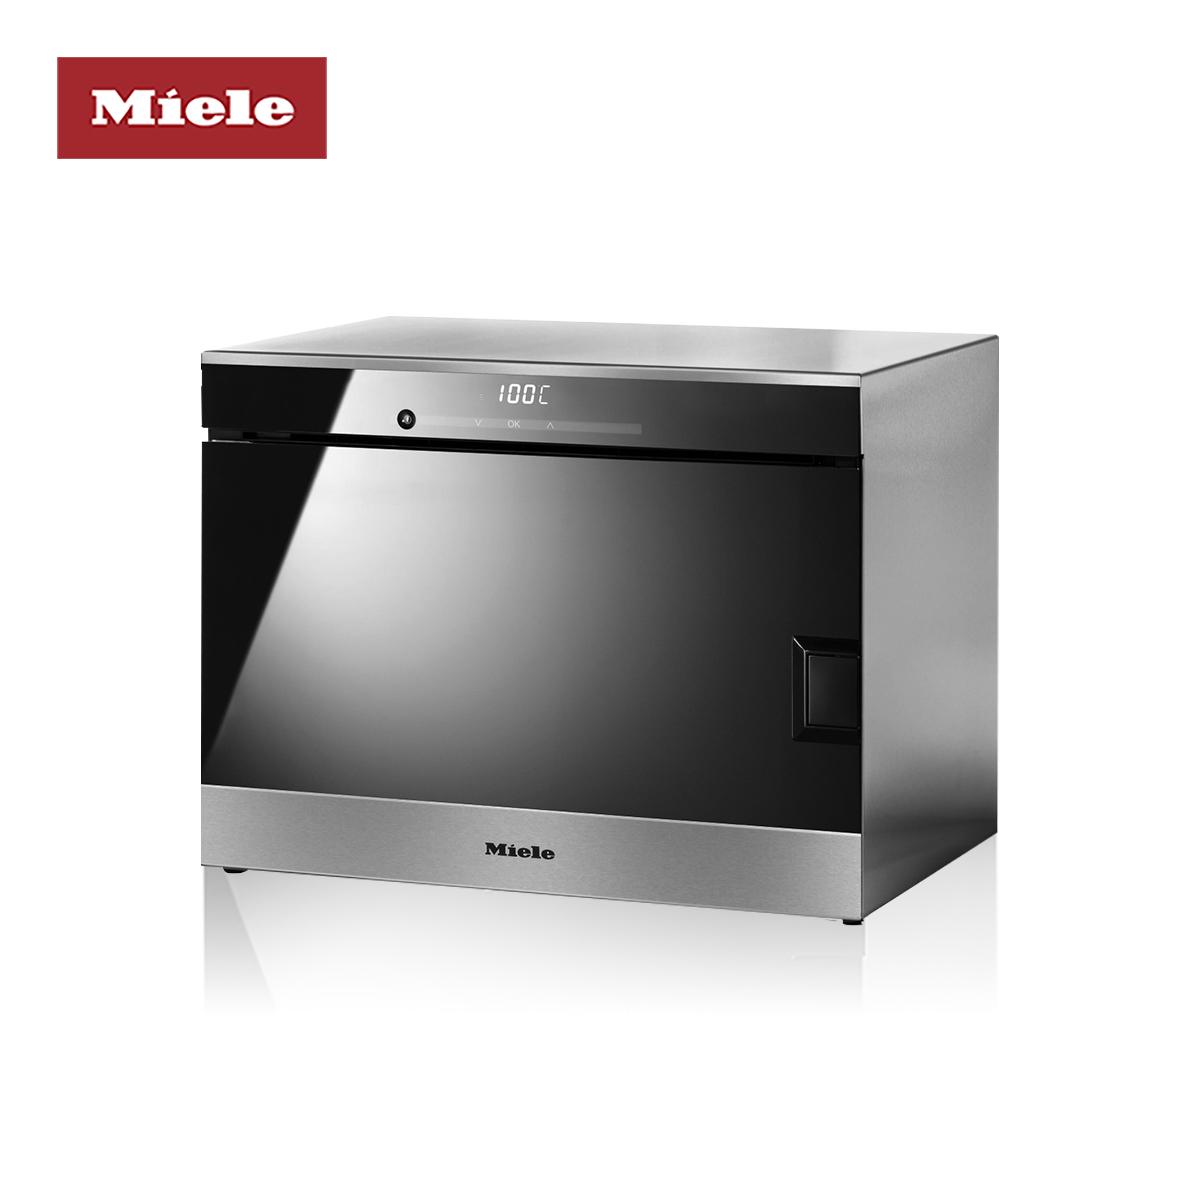 Miele/美诺 DG 6019全触屏智能台式独立式高端进口家用蒸箱电蒸炉